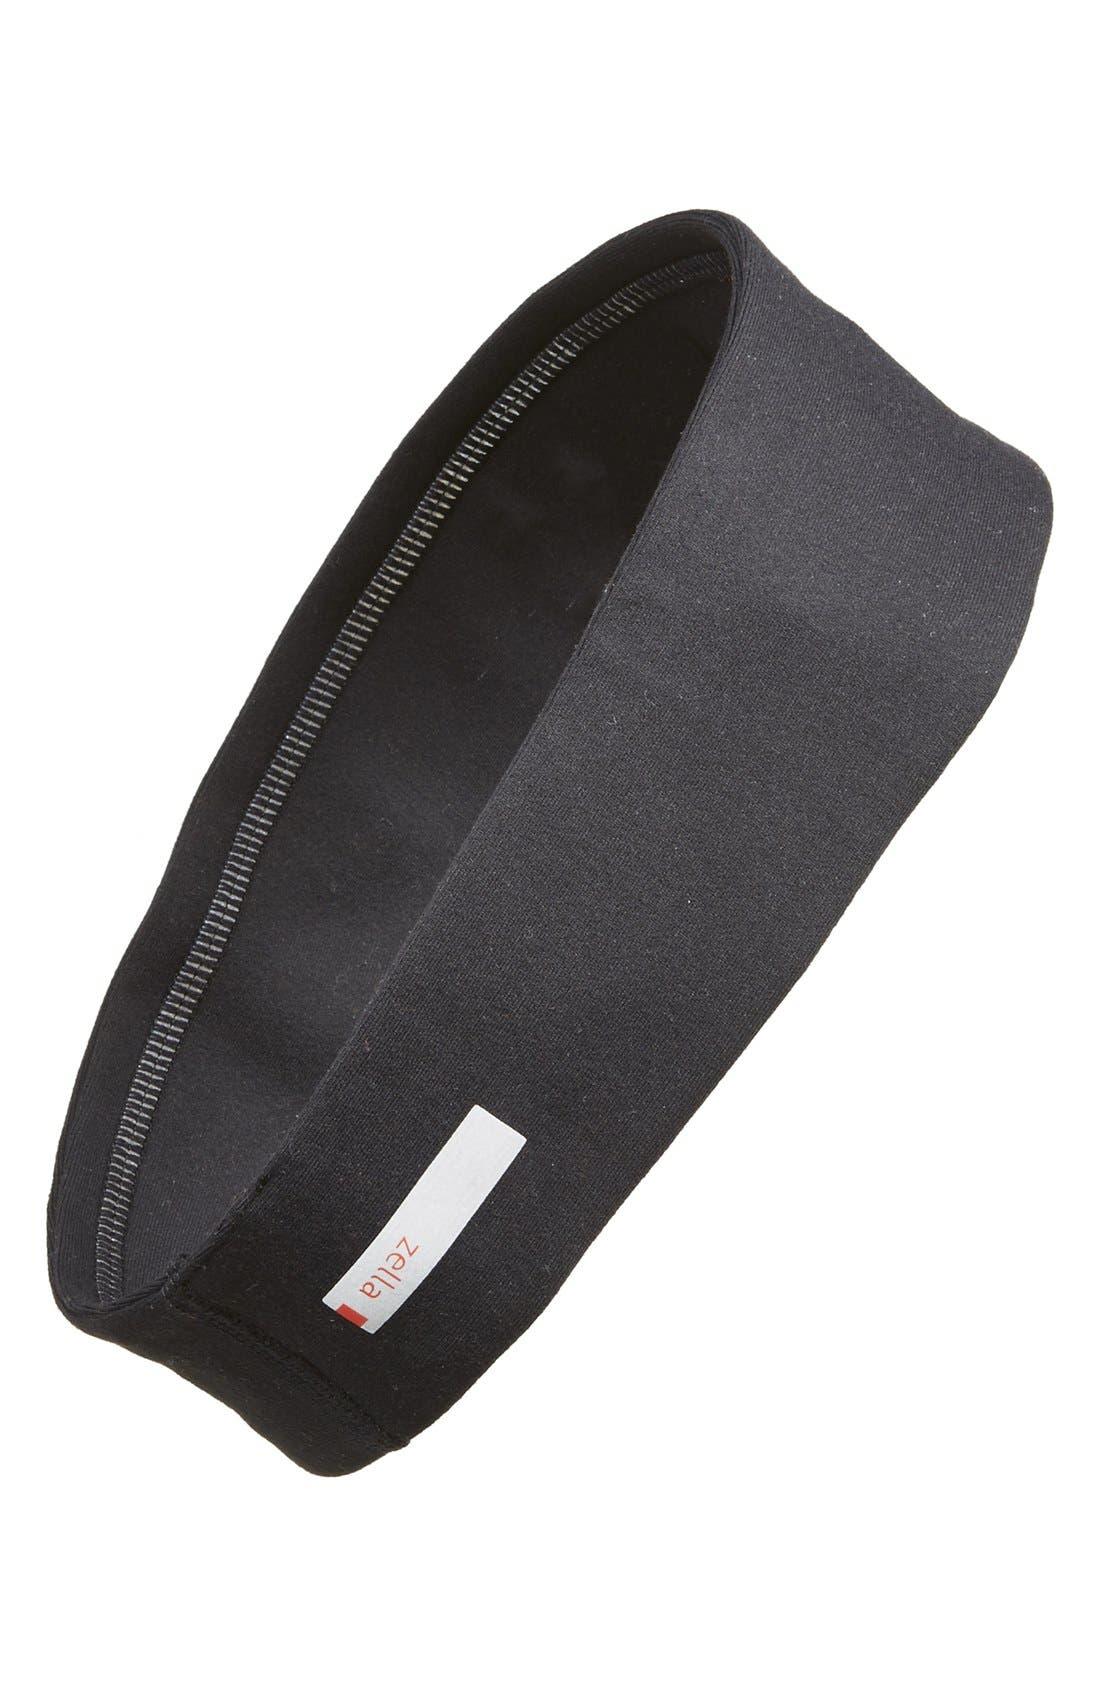 'Zeltek' Reflective Headband,                             Main thumbnail 1, color,                             BLACK